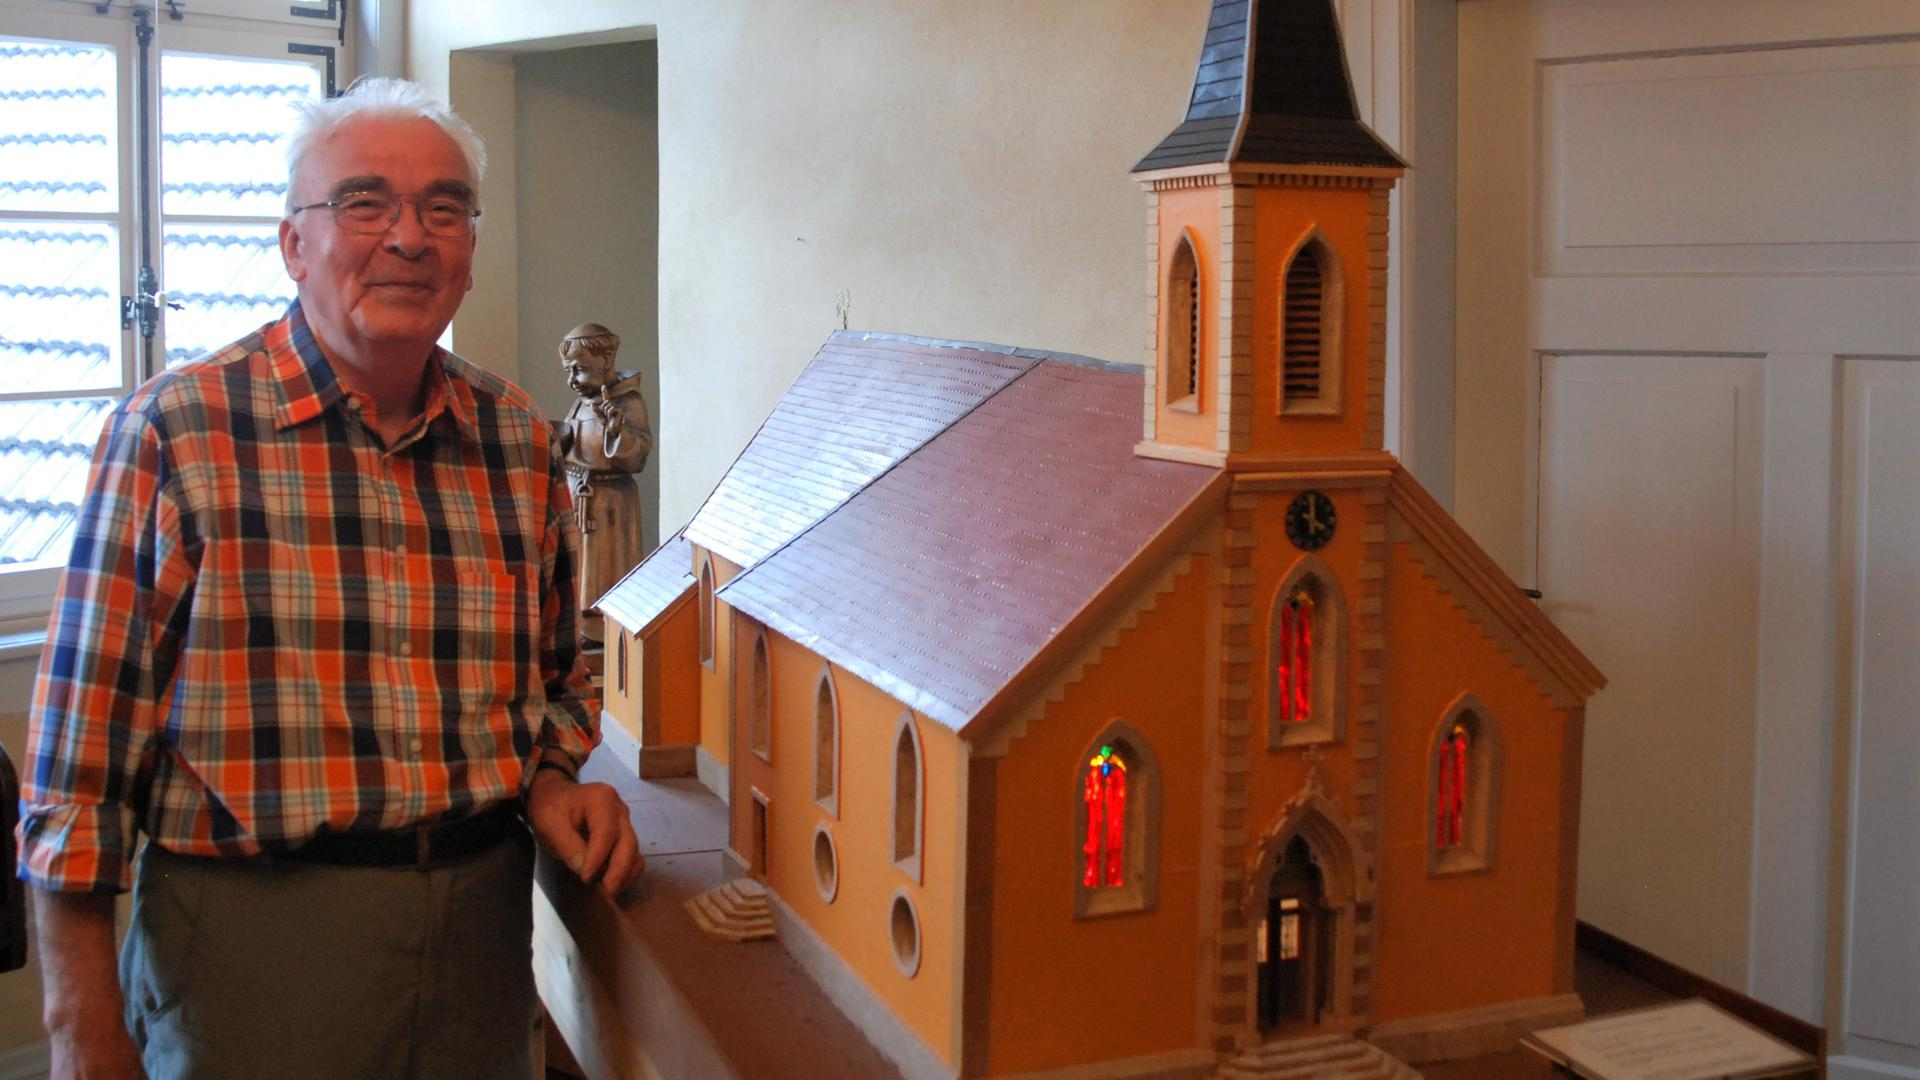 alter Mann neben Modellkirche